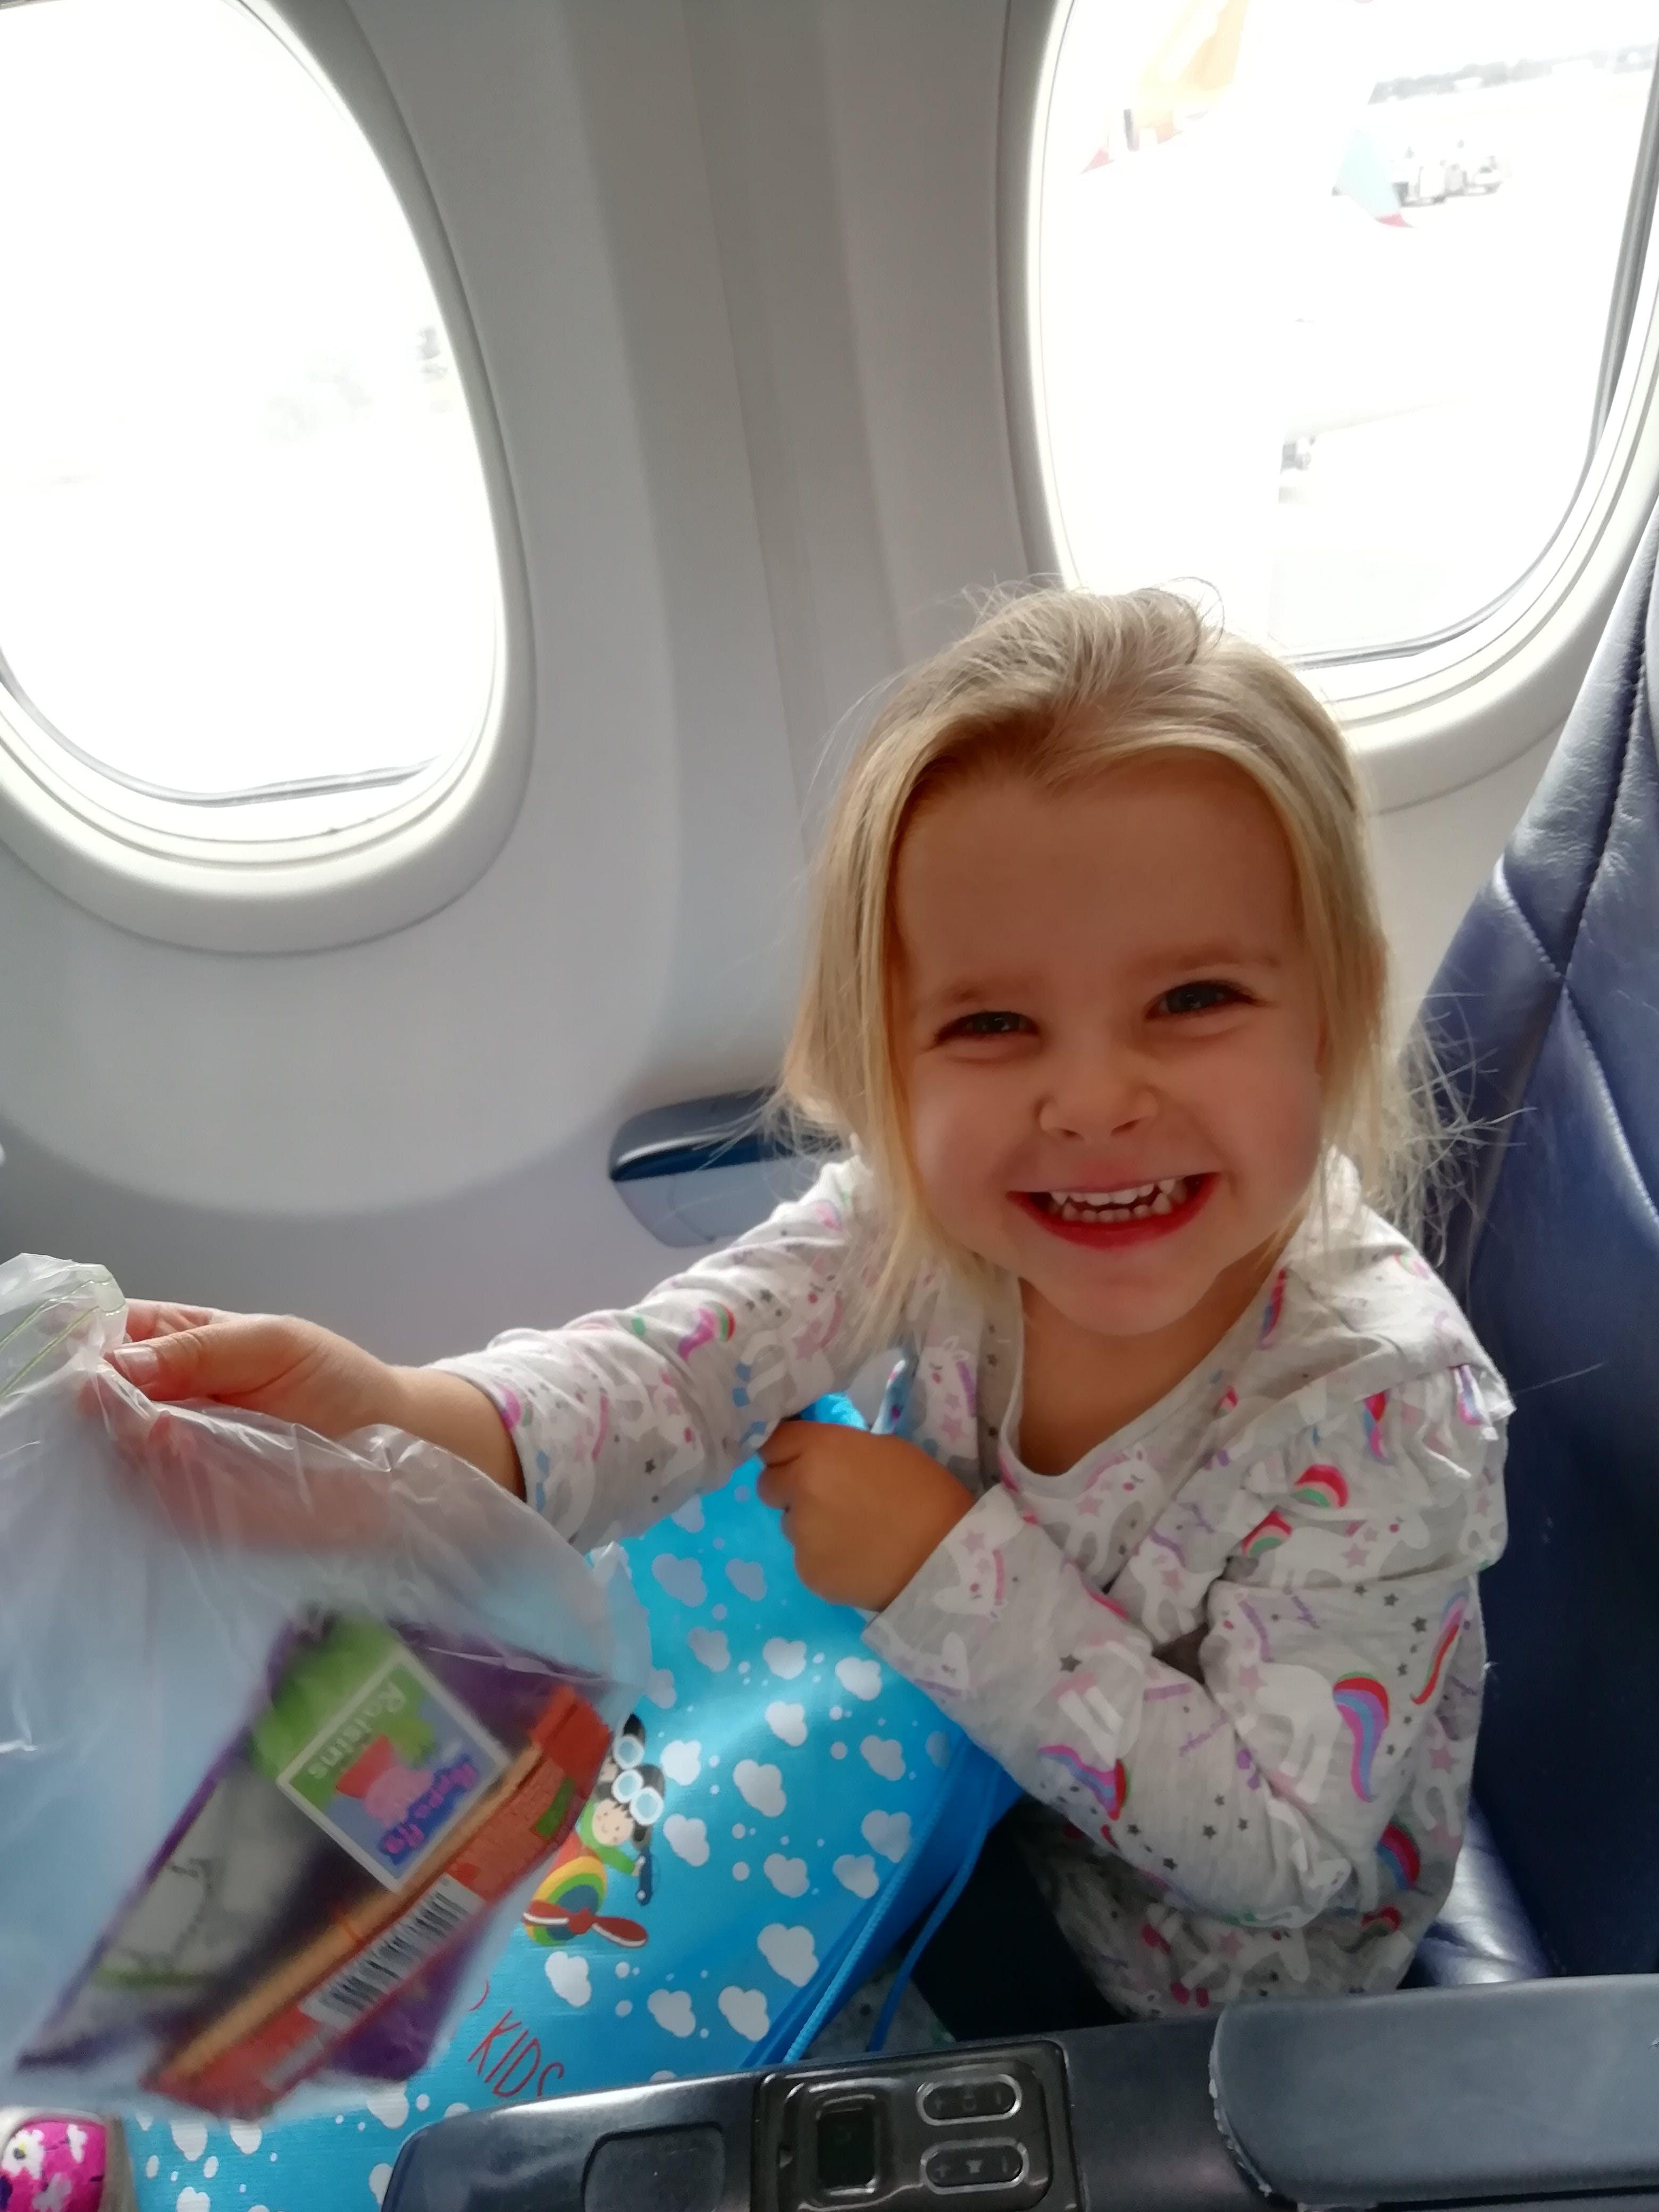 Medium Trip: For Girls Age 3-5 Years